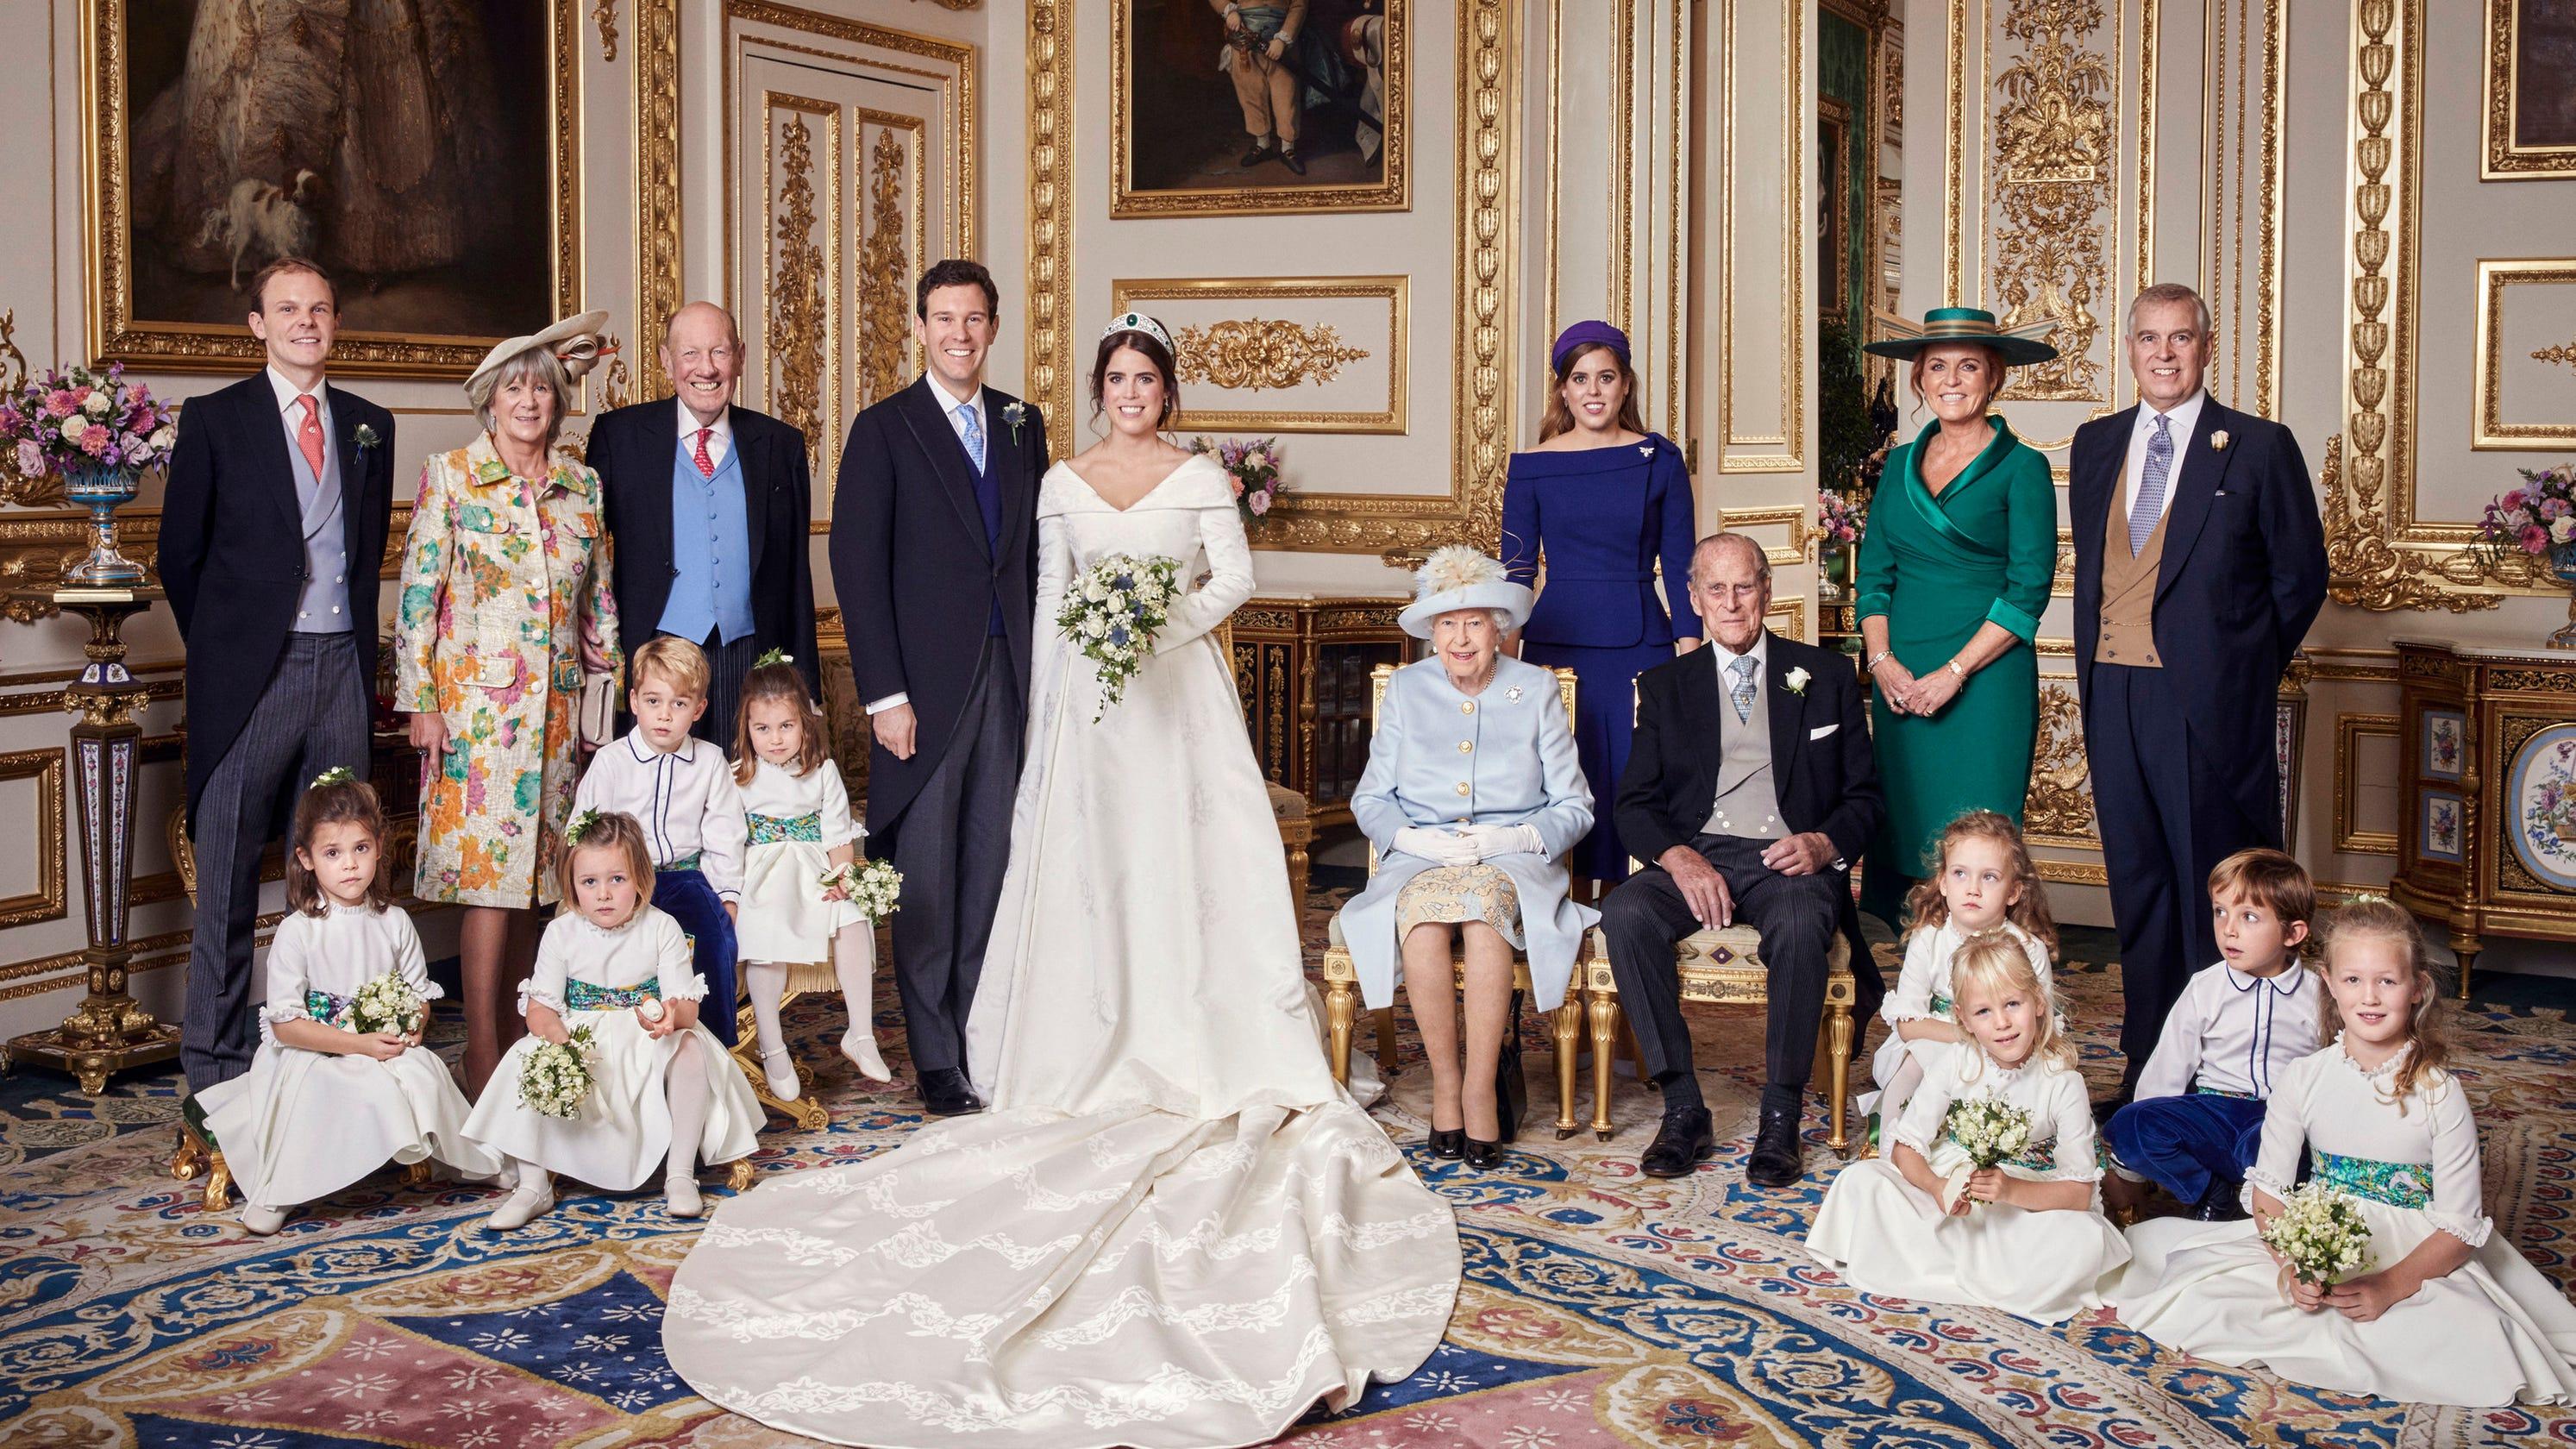 Princess Eugenie, Jack Brooksbank Share Official Royal